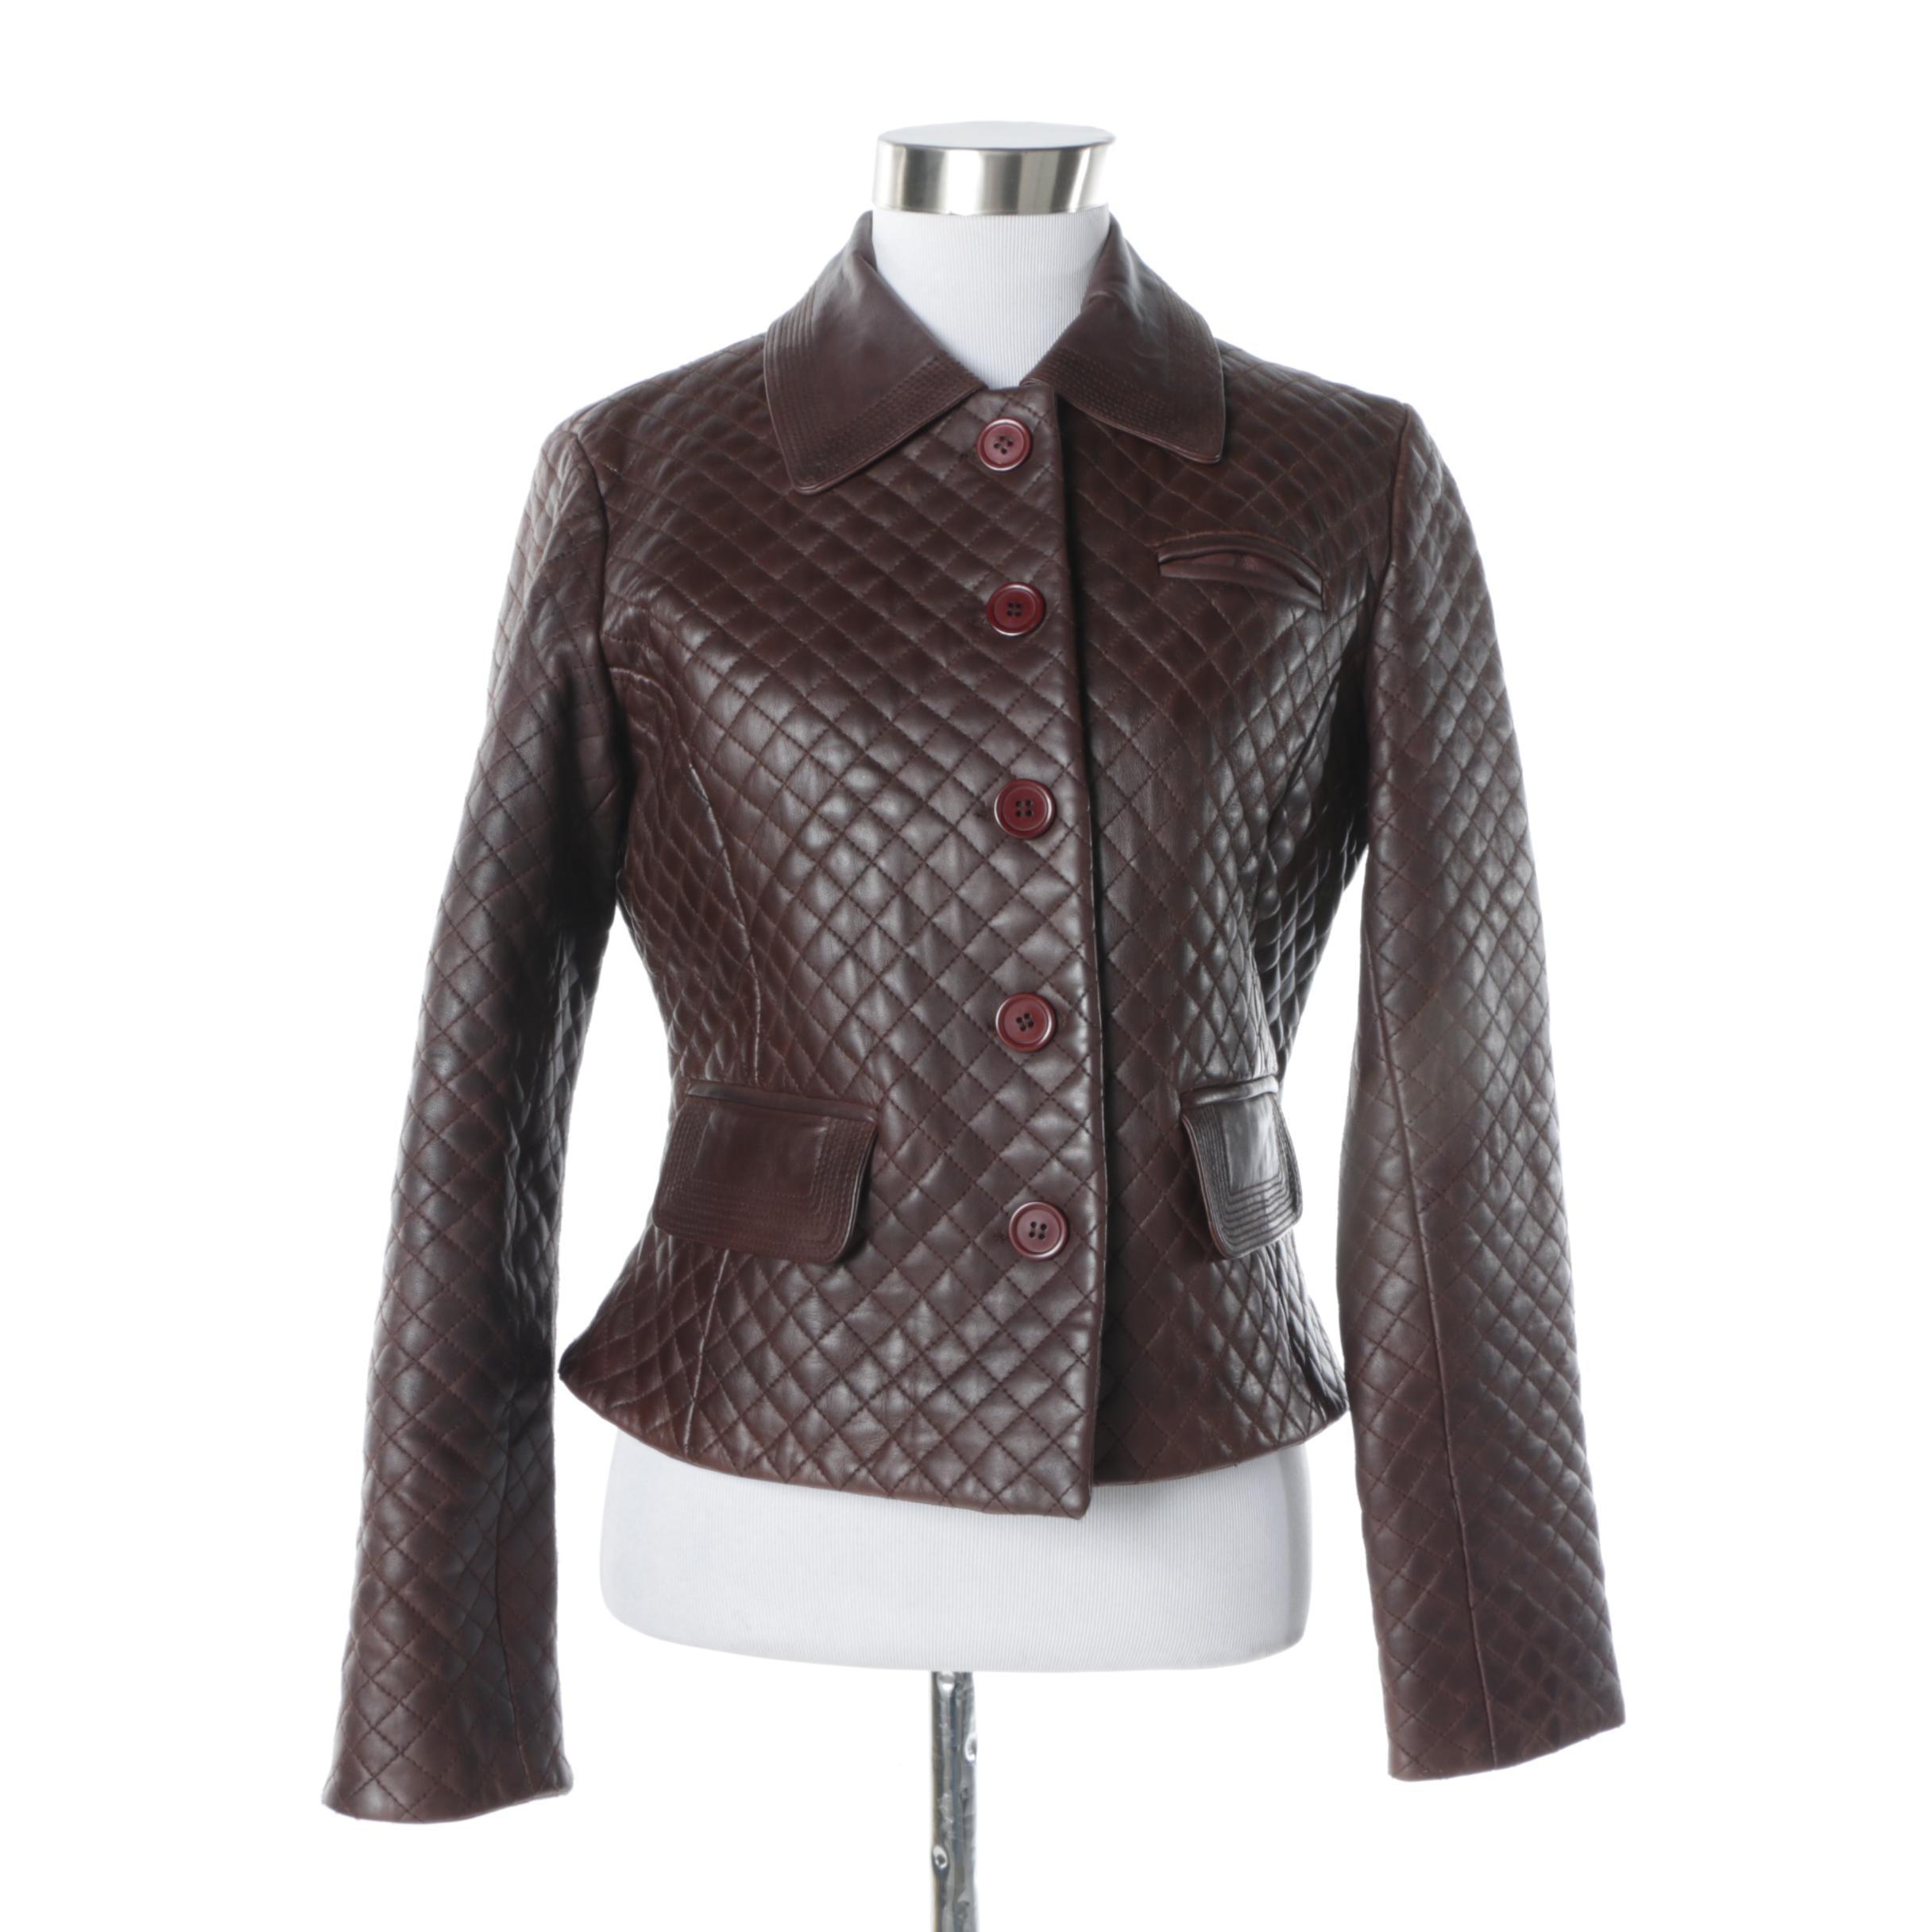 Women's Margaret Godfrey Dark Brown Quilted Leather Jacket